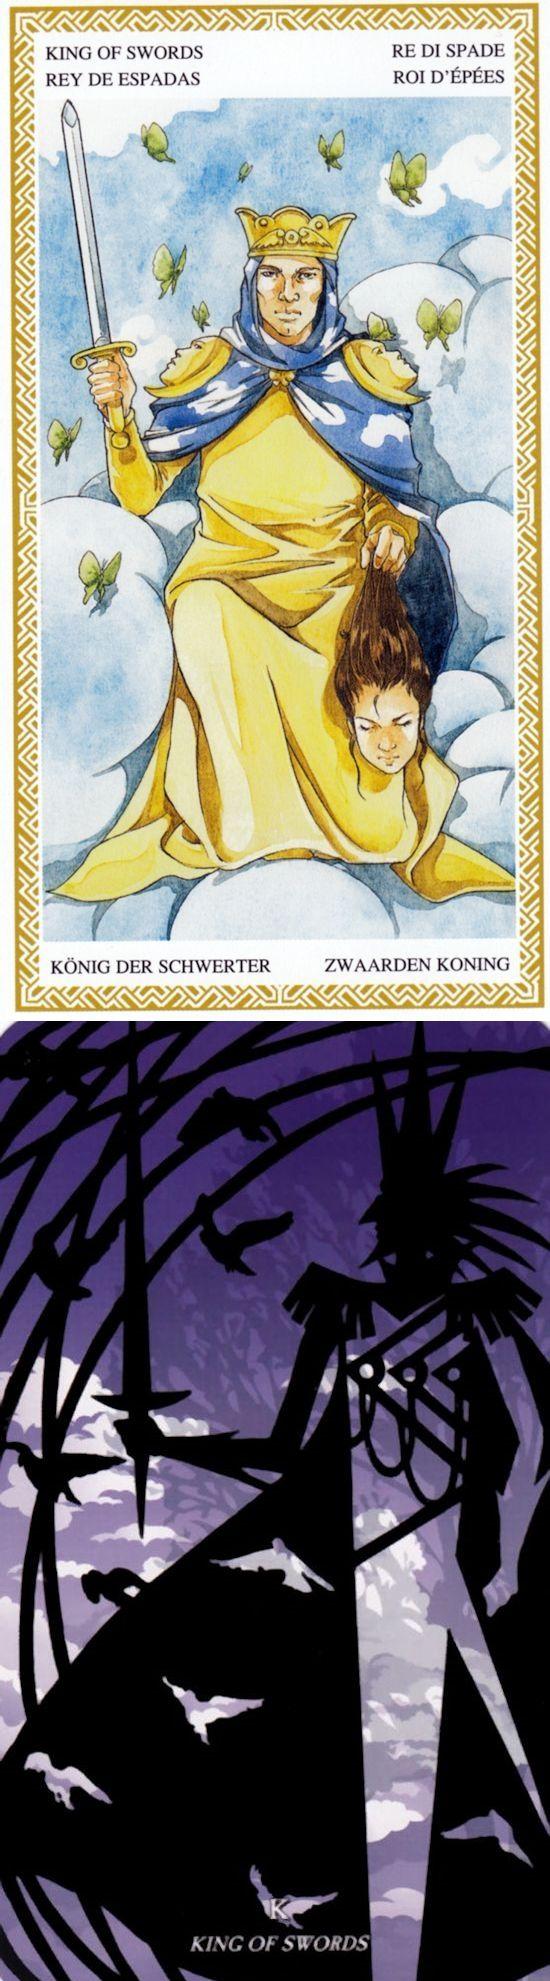 King of Swords: power and manipulative (reverse). Loscarabeo Tarot deck and Silhouette Tarot deck: tero card, tarotaquarius vs free lotus tarot reading 2016. The best tarot cards art and divination spell. #gothwitch #pentagram #empress #goth